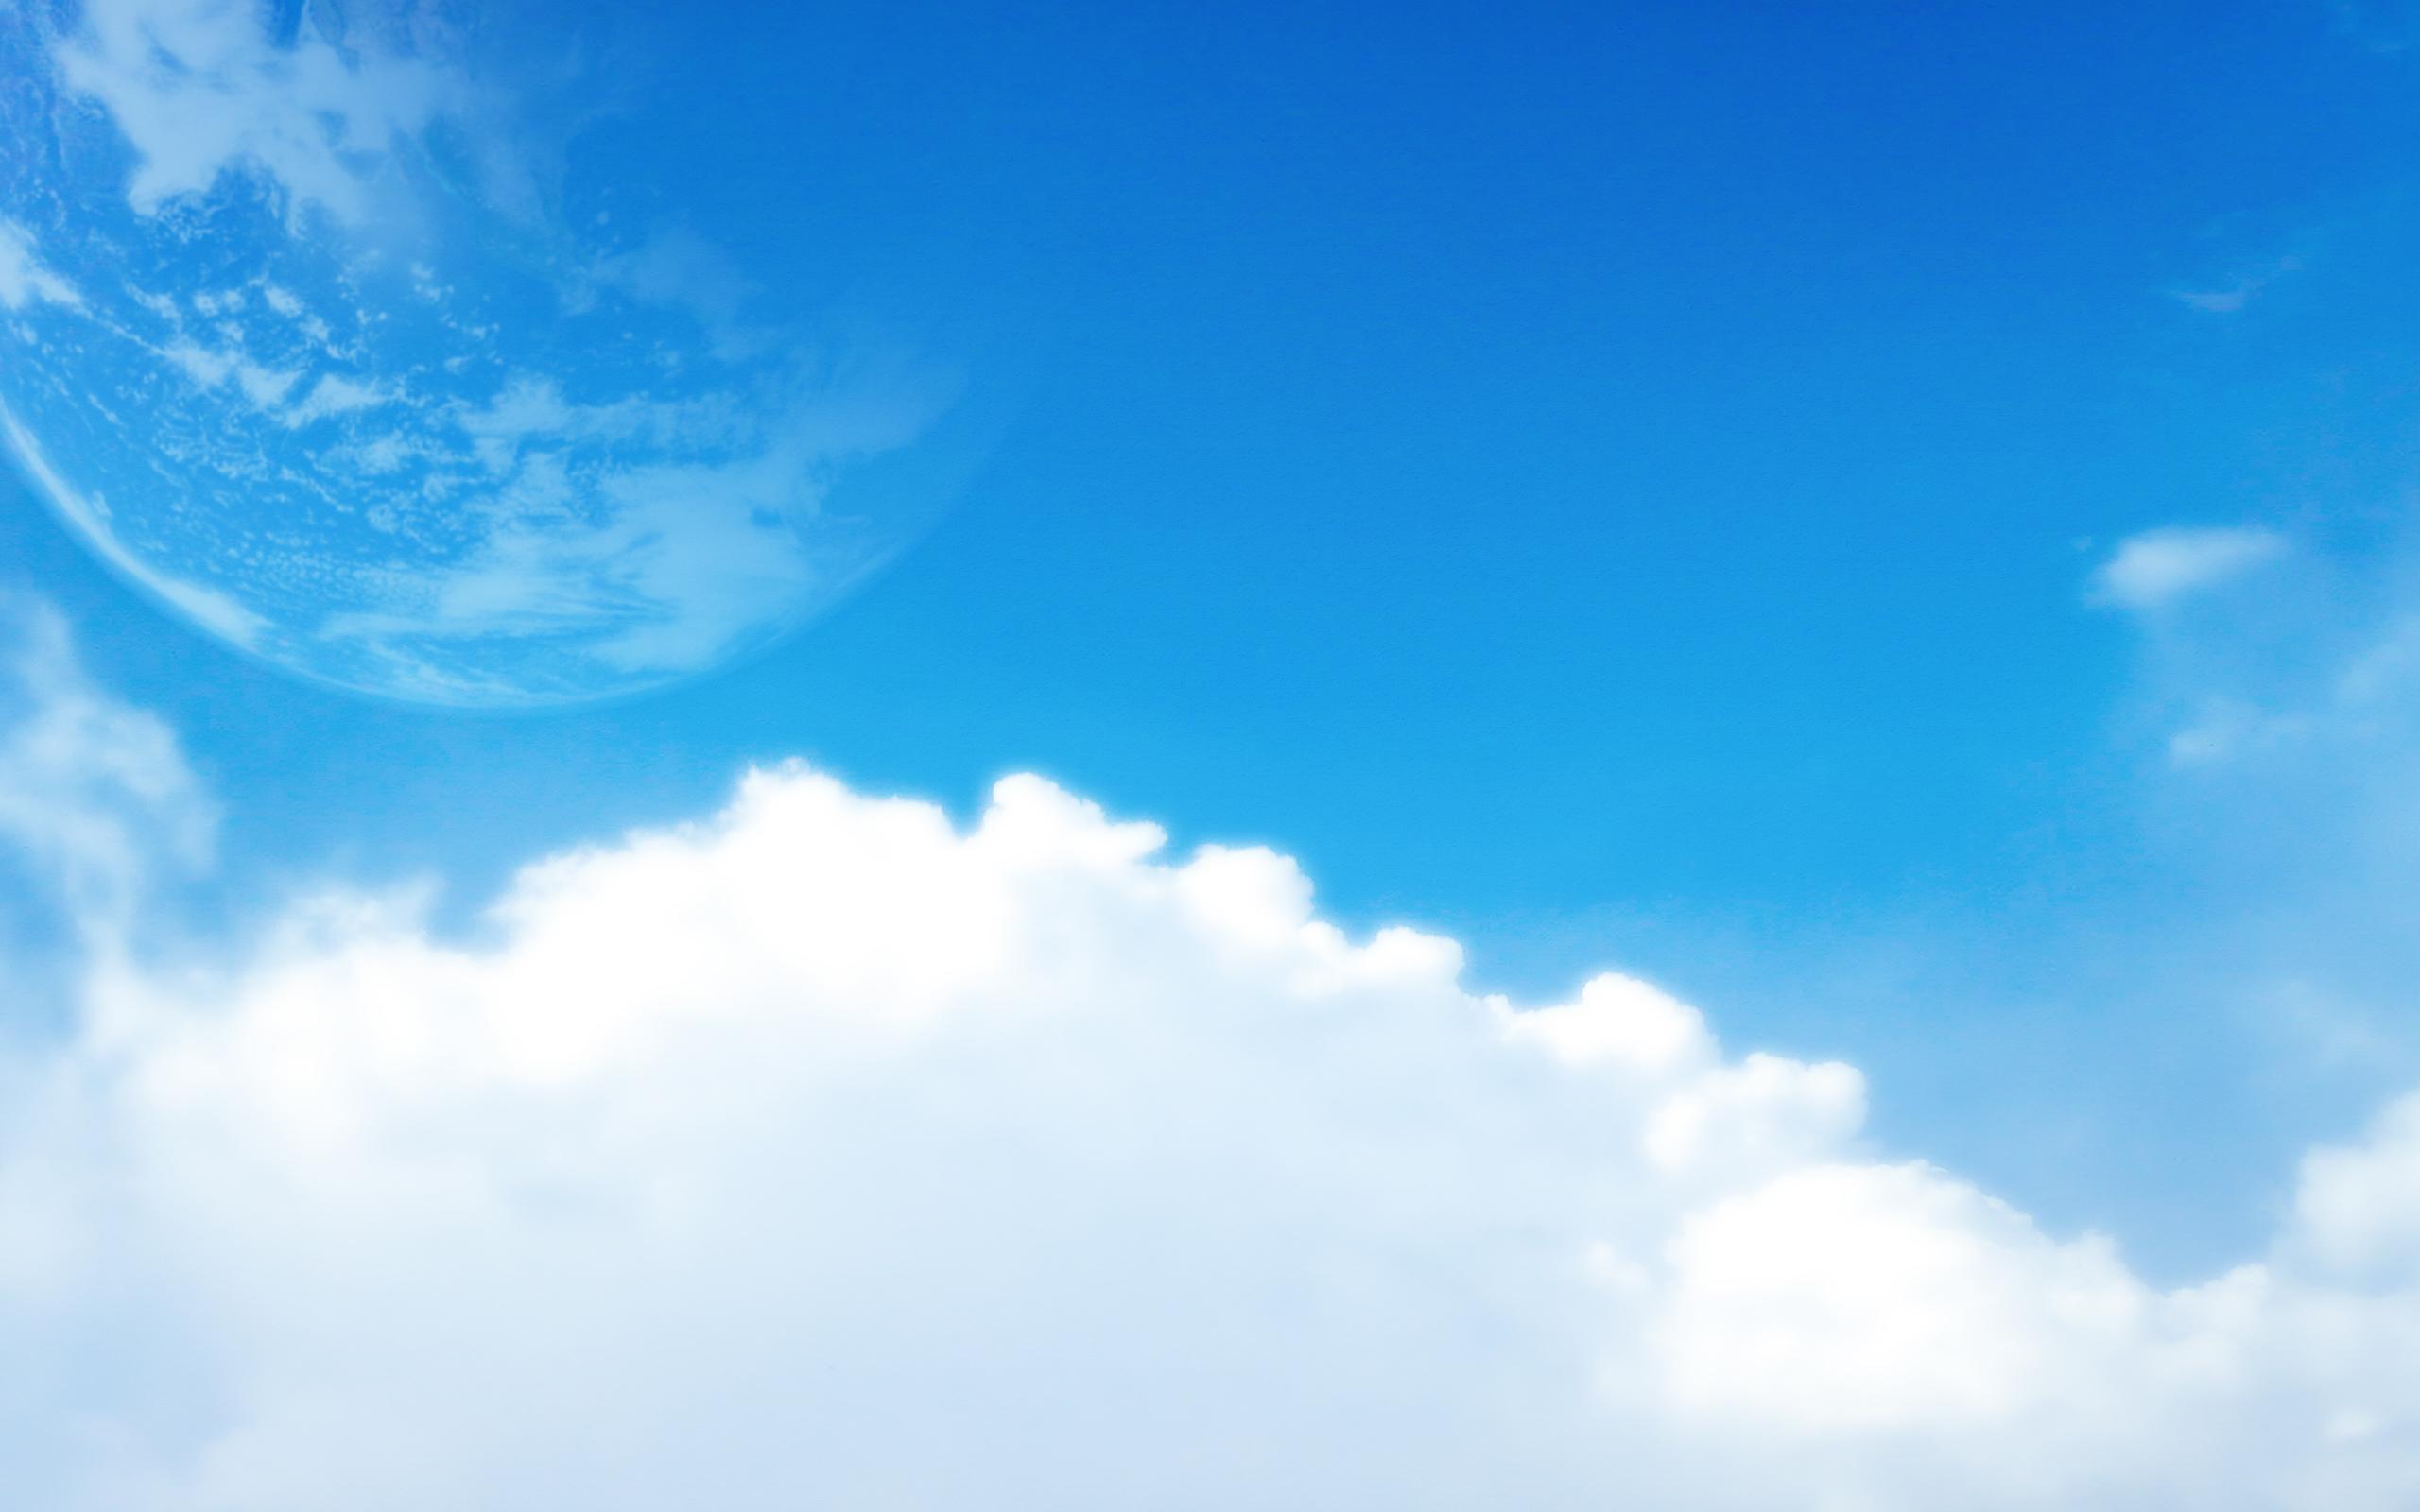 Sky Dreams Wallpapers HD Wallpapers 2560x1600